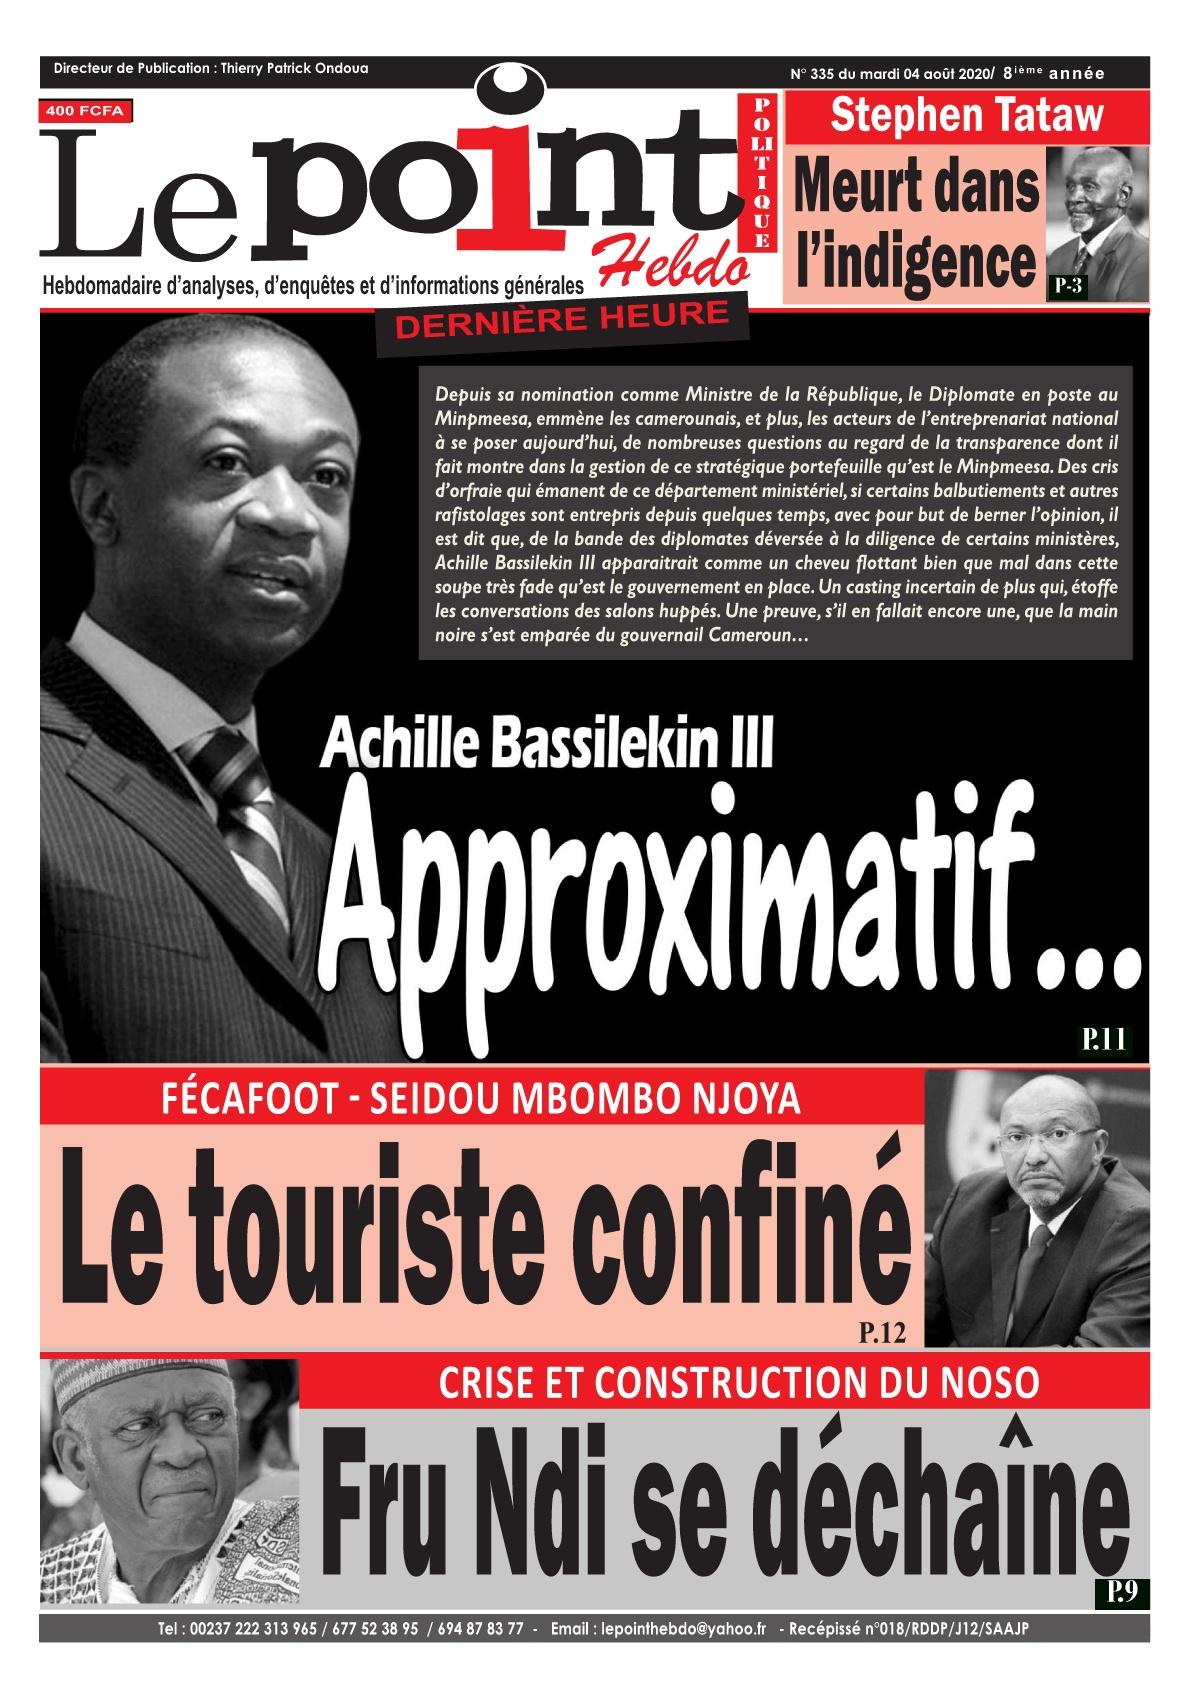 Le Point - 04/08/2020